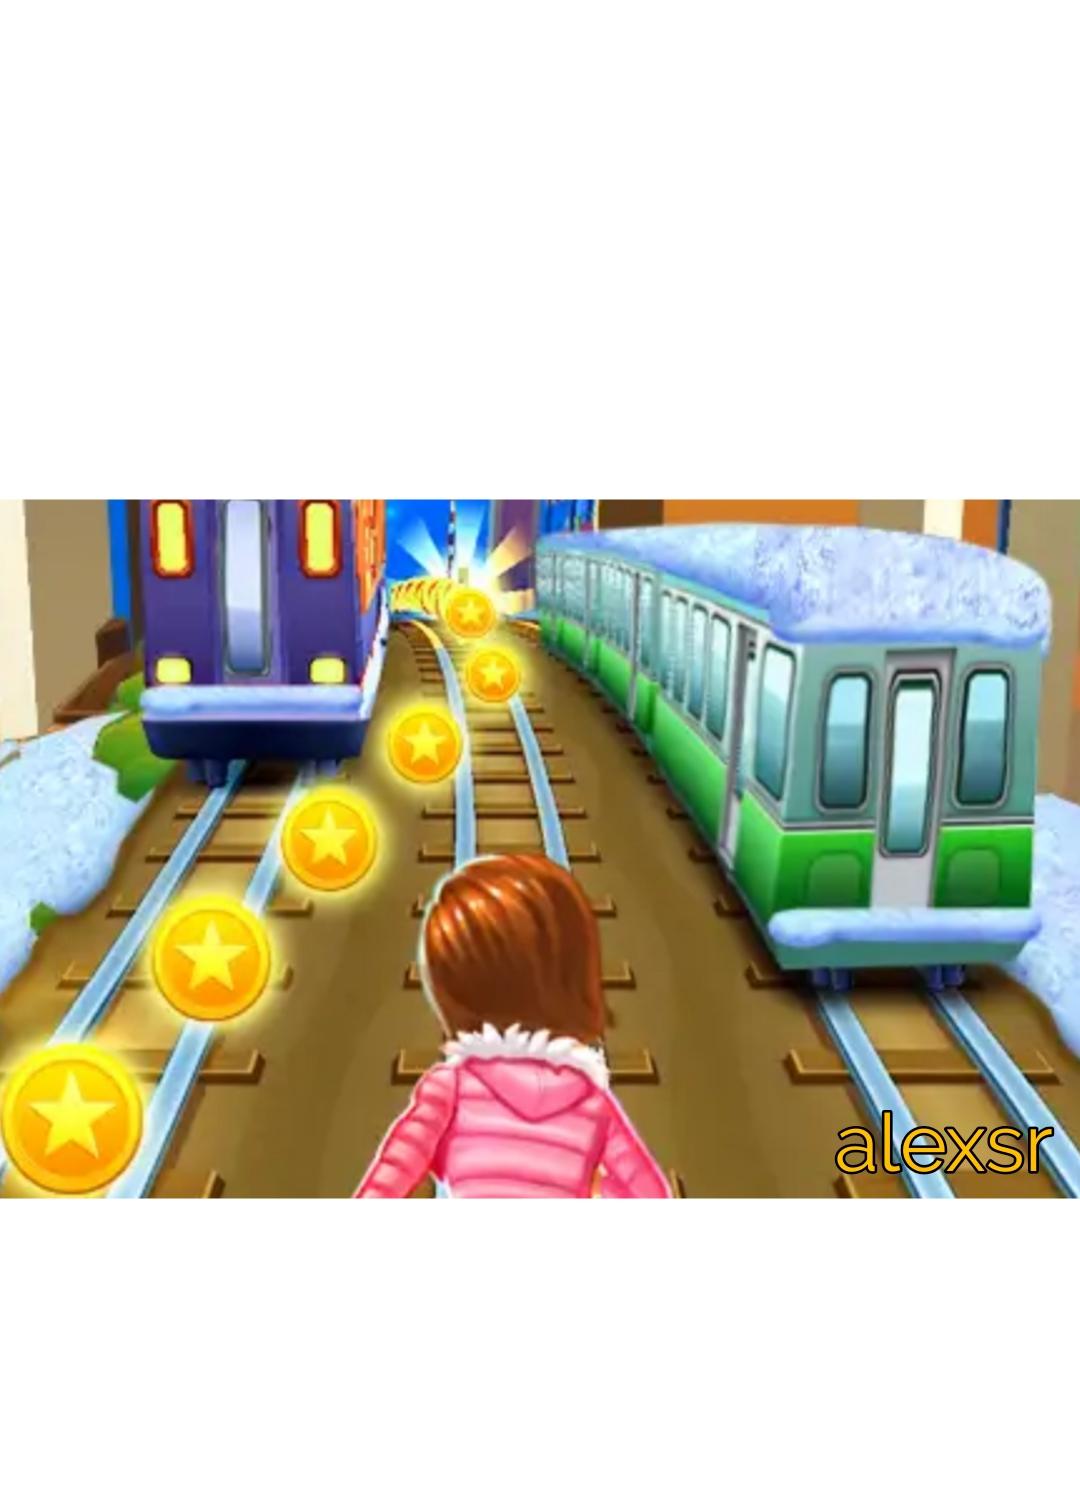 Subway Princess Runner  تحميل لعبة  الأميرة  عداء مترو الانفاق